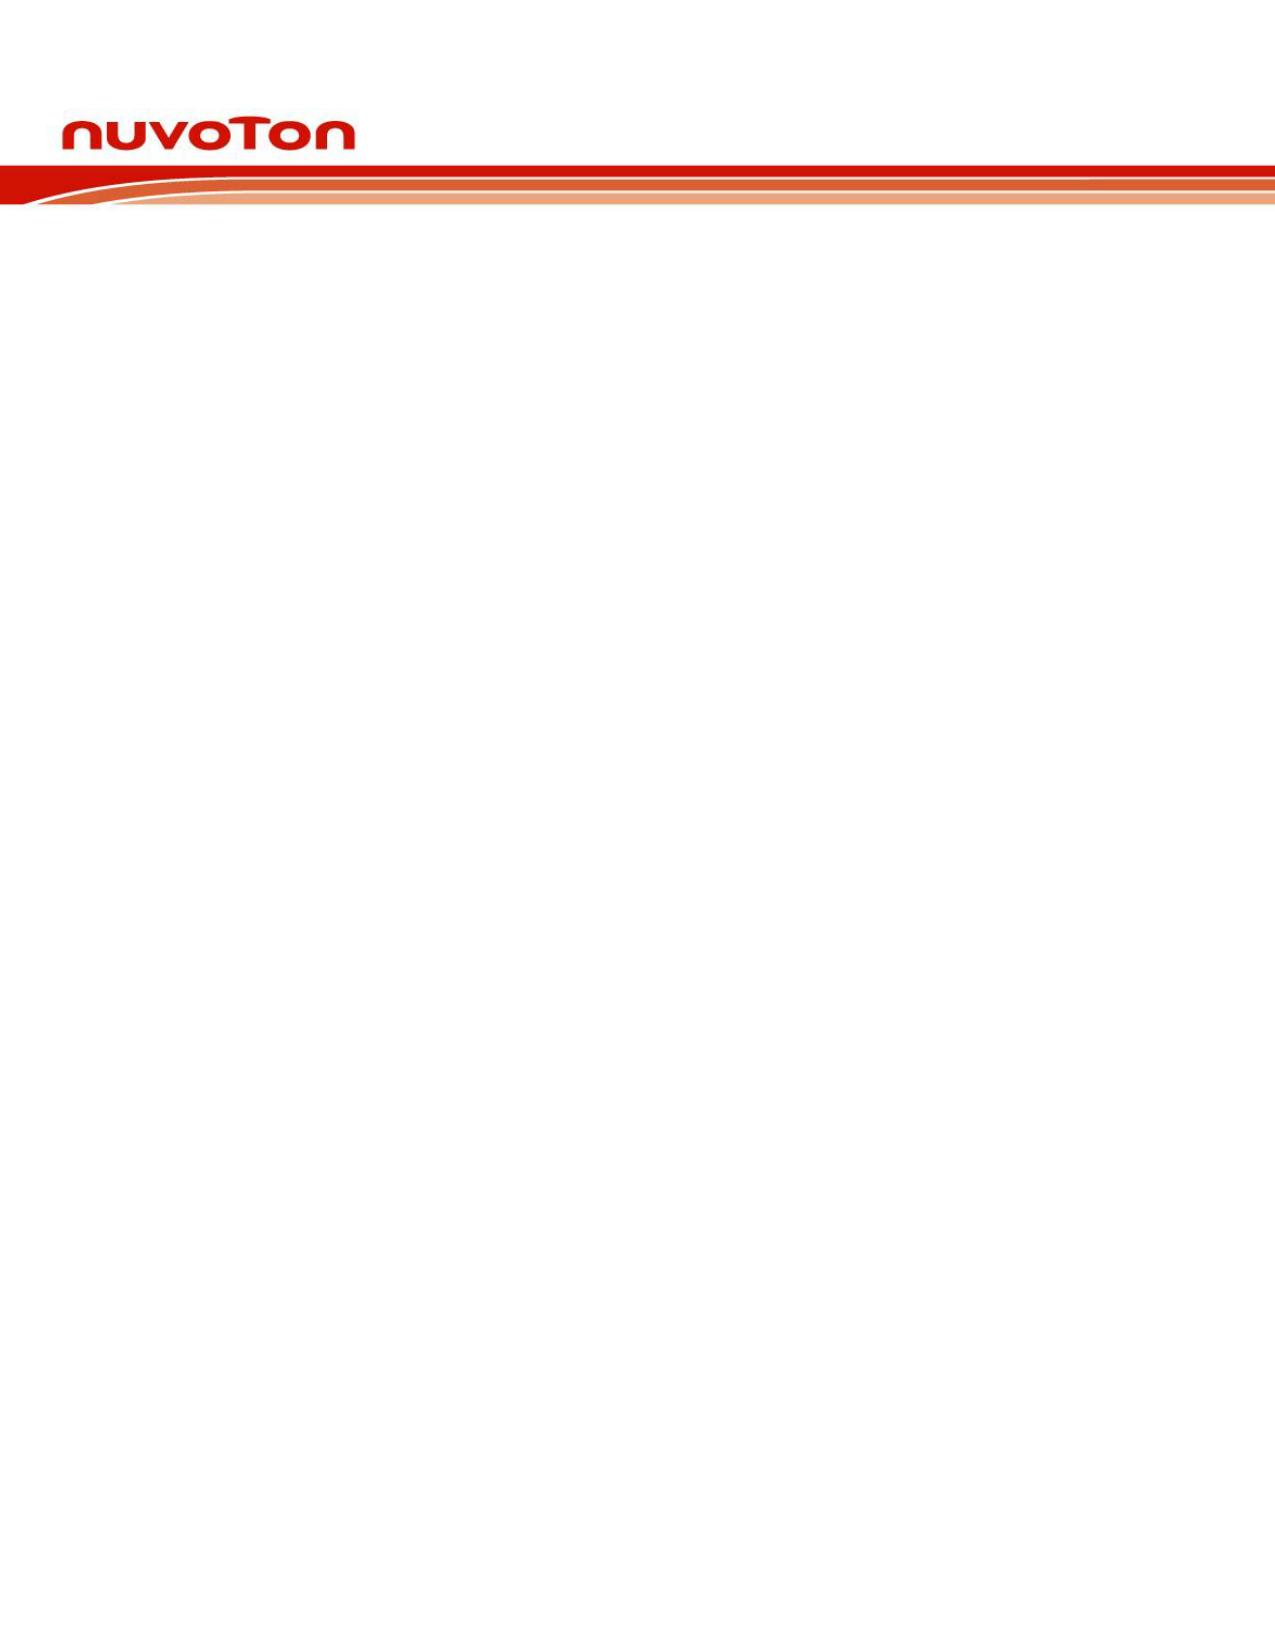 M0516ZBN دیتاشیت PDF